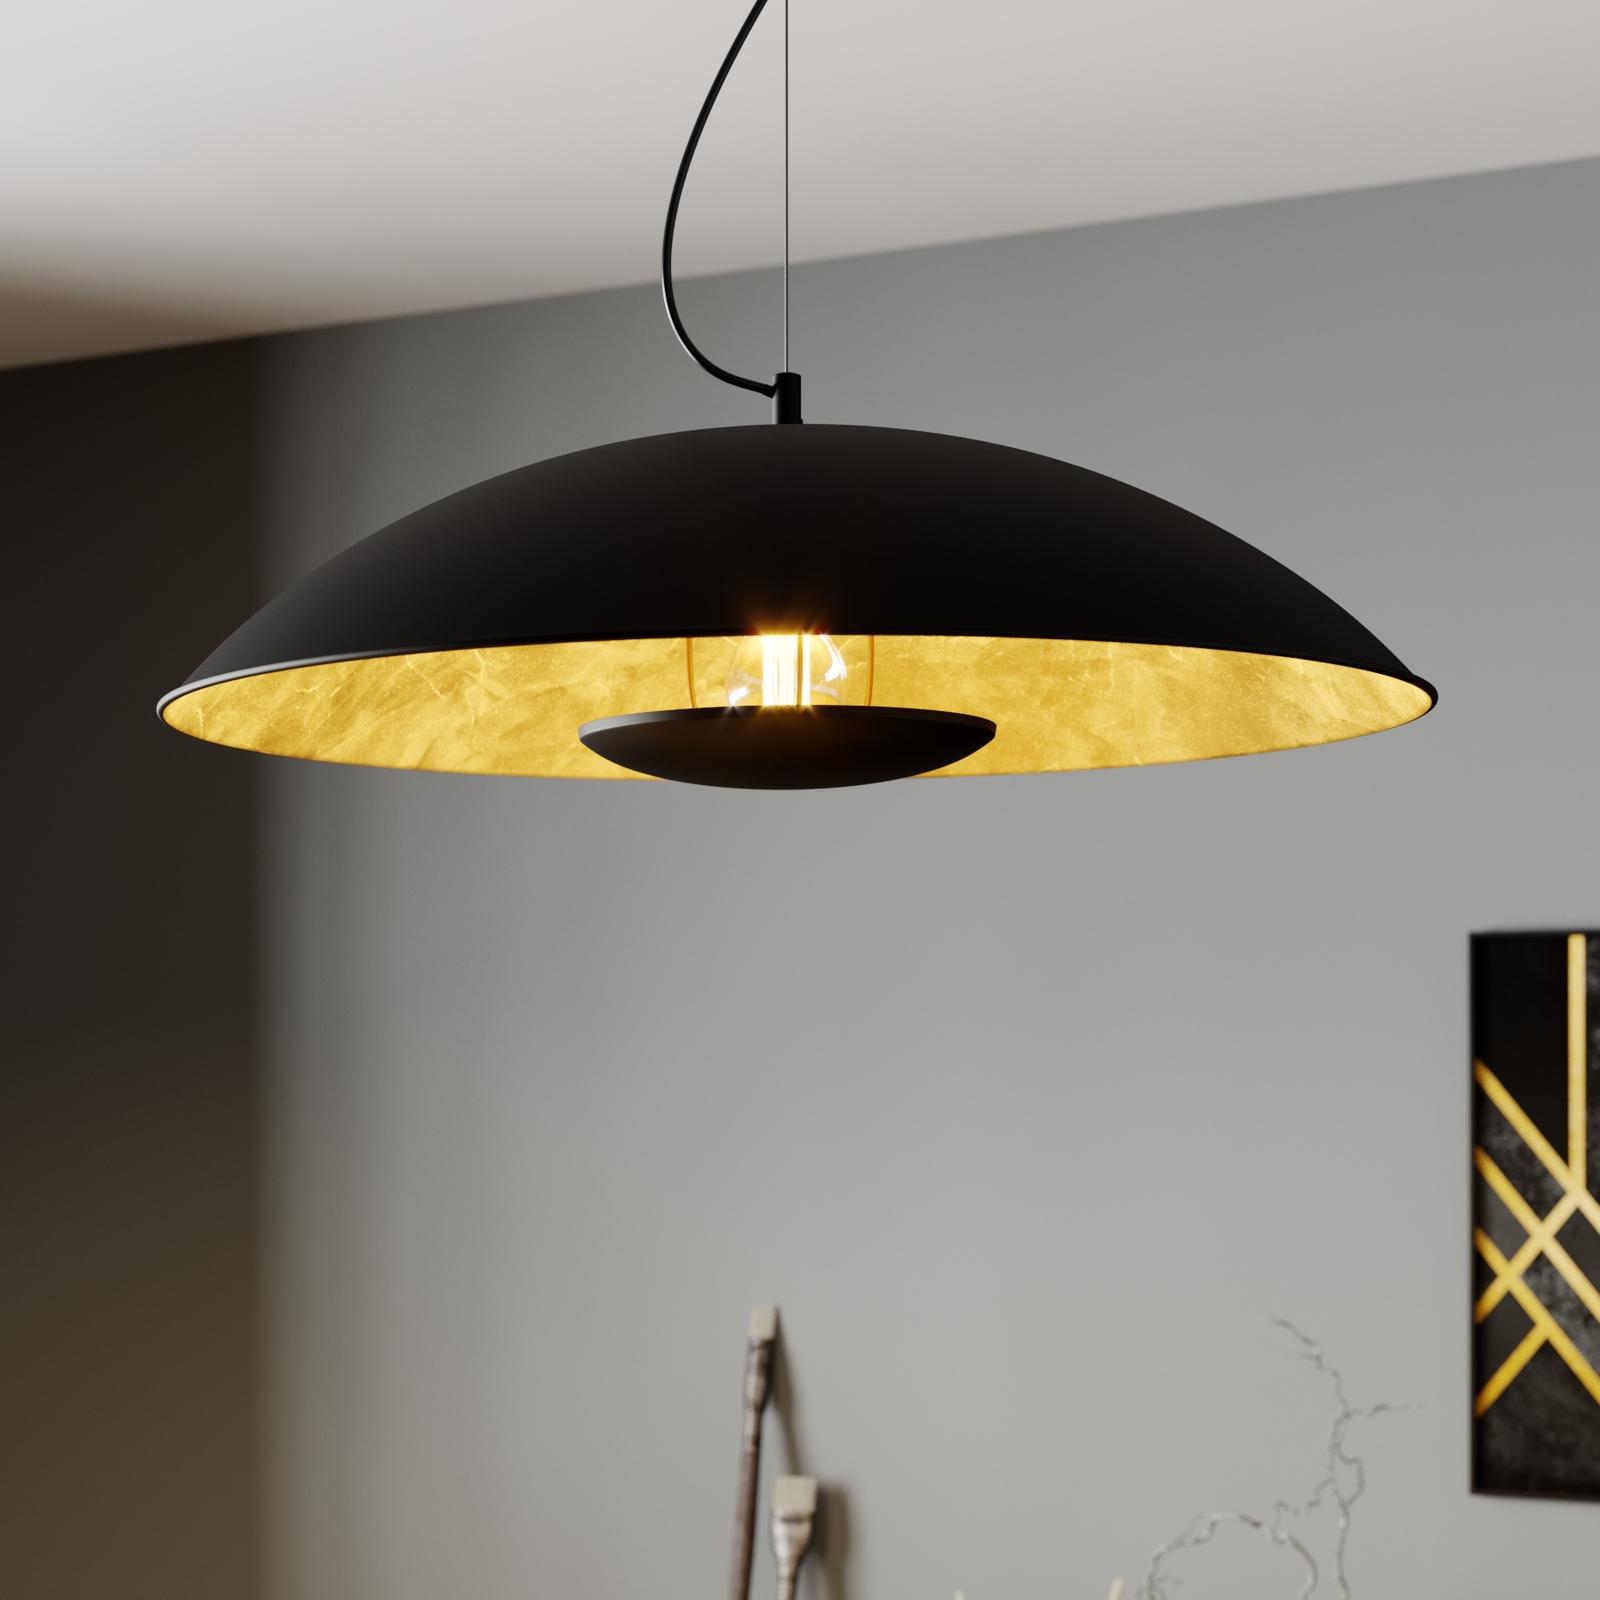 Lámpara colgante Emilienne con luz indirecta